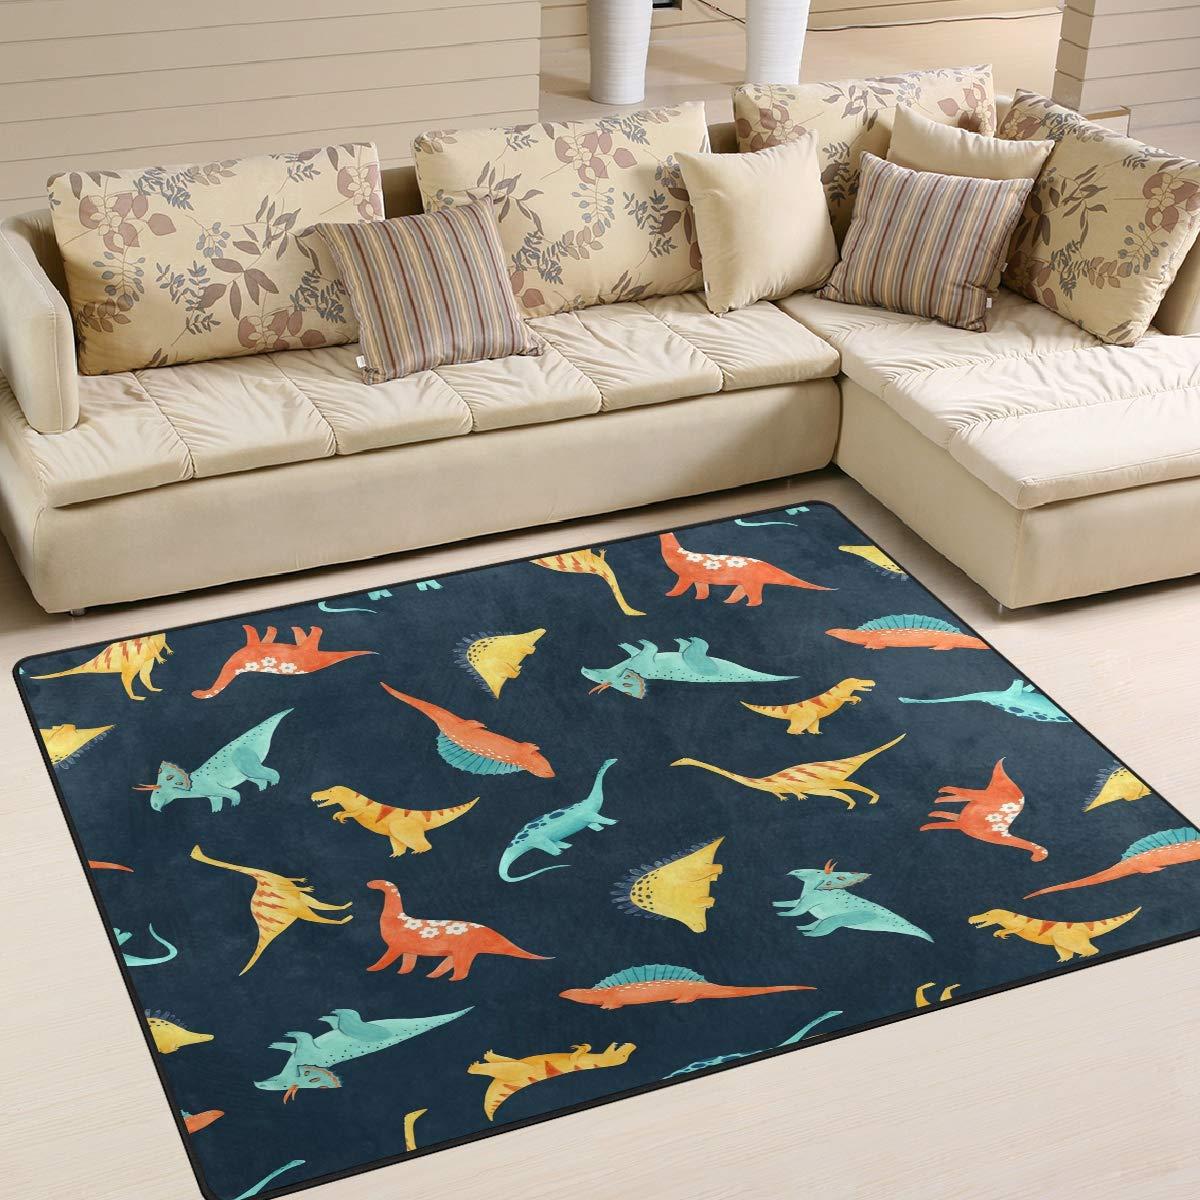 ALAZA Cute Dinosaur Non Slip Area Rug 2 x 3 Modern Floor Rugs Mat for Living Room Bedroom Dinning Room Home Decor